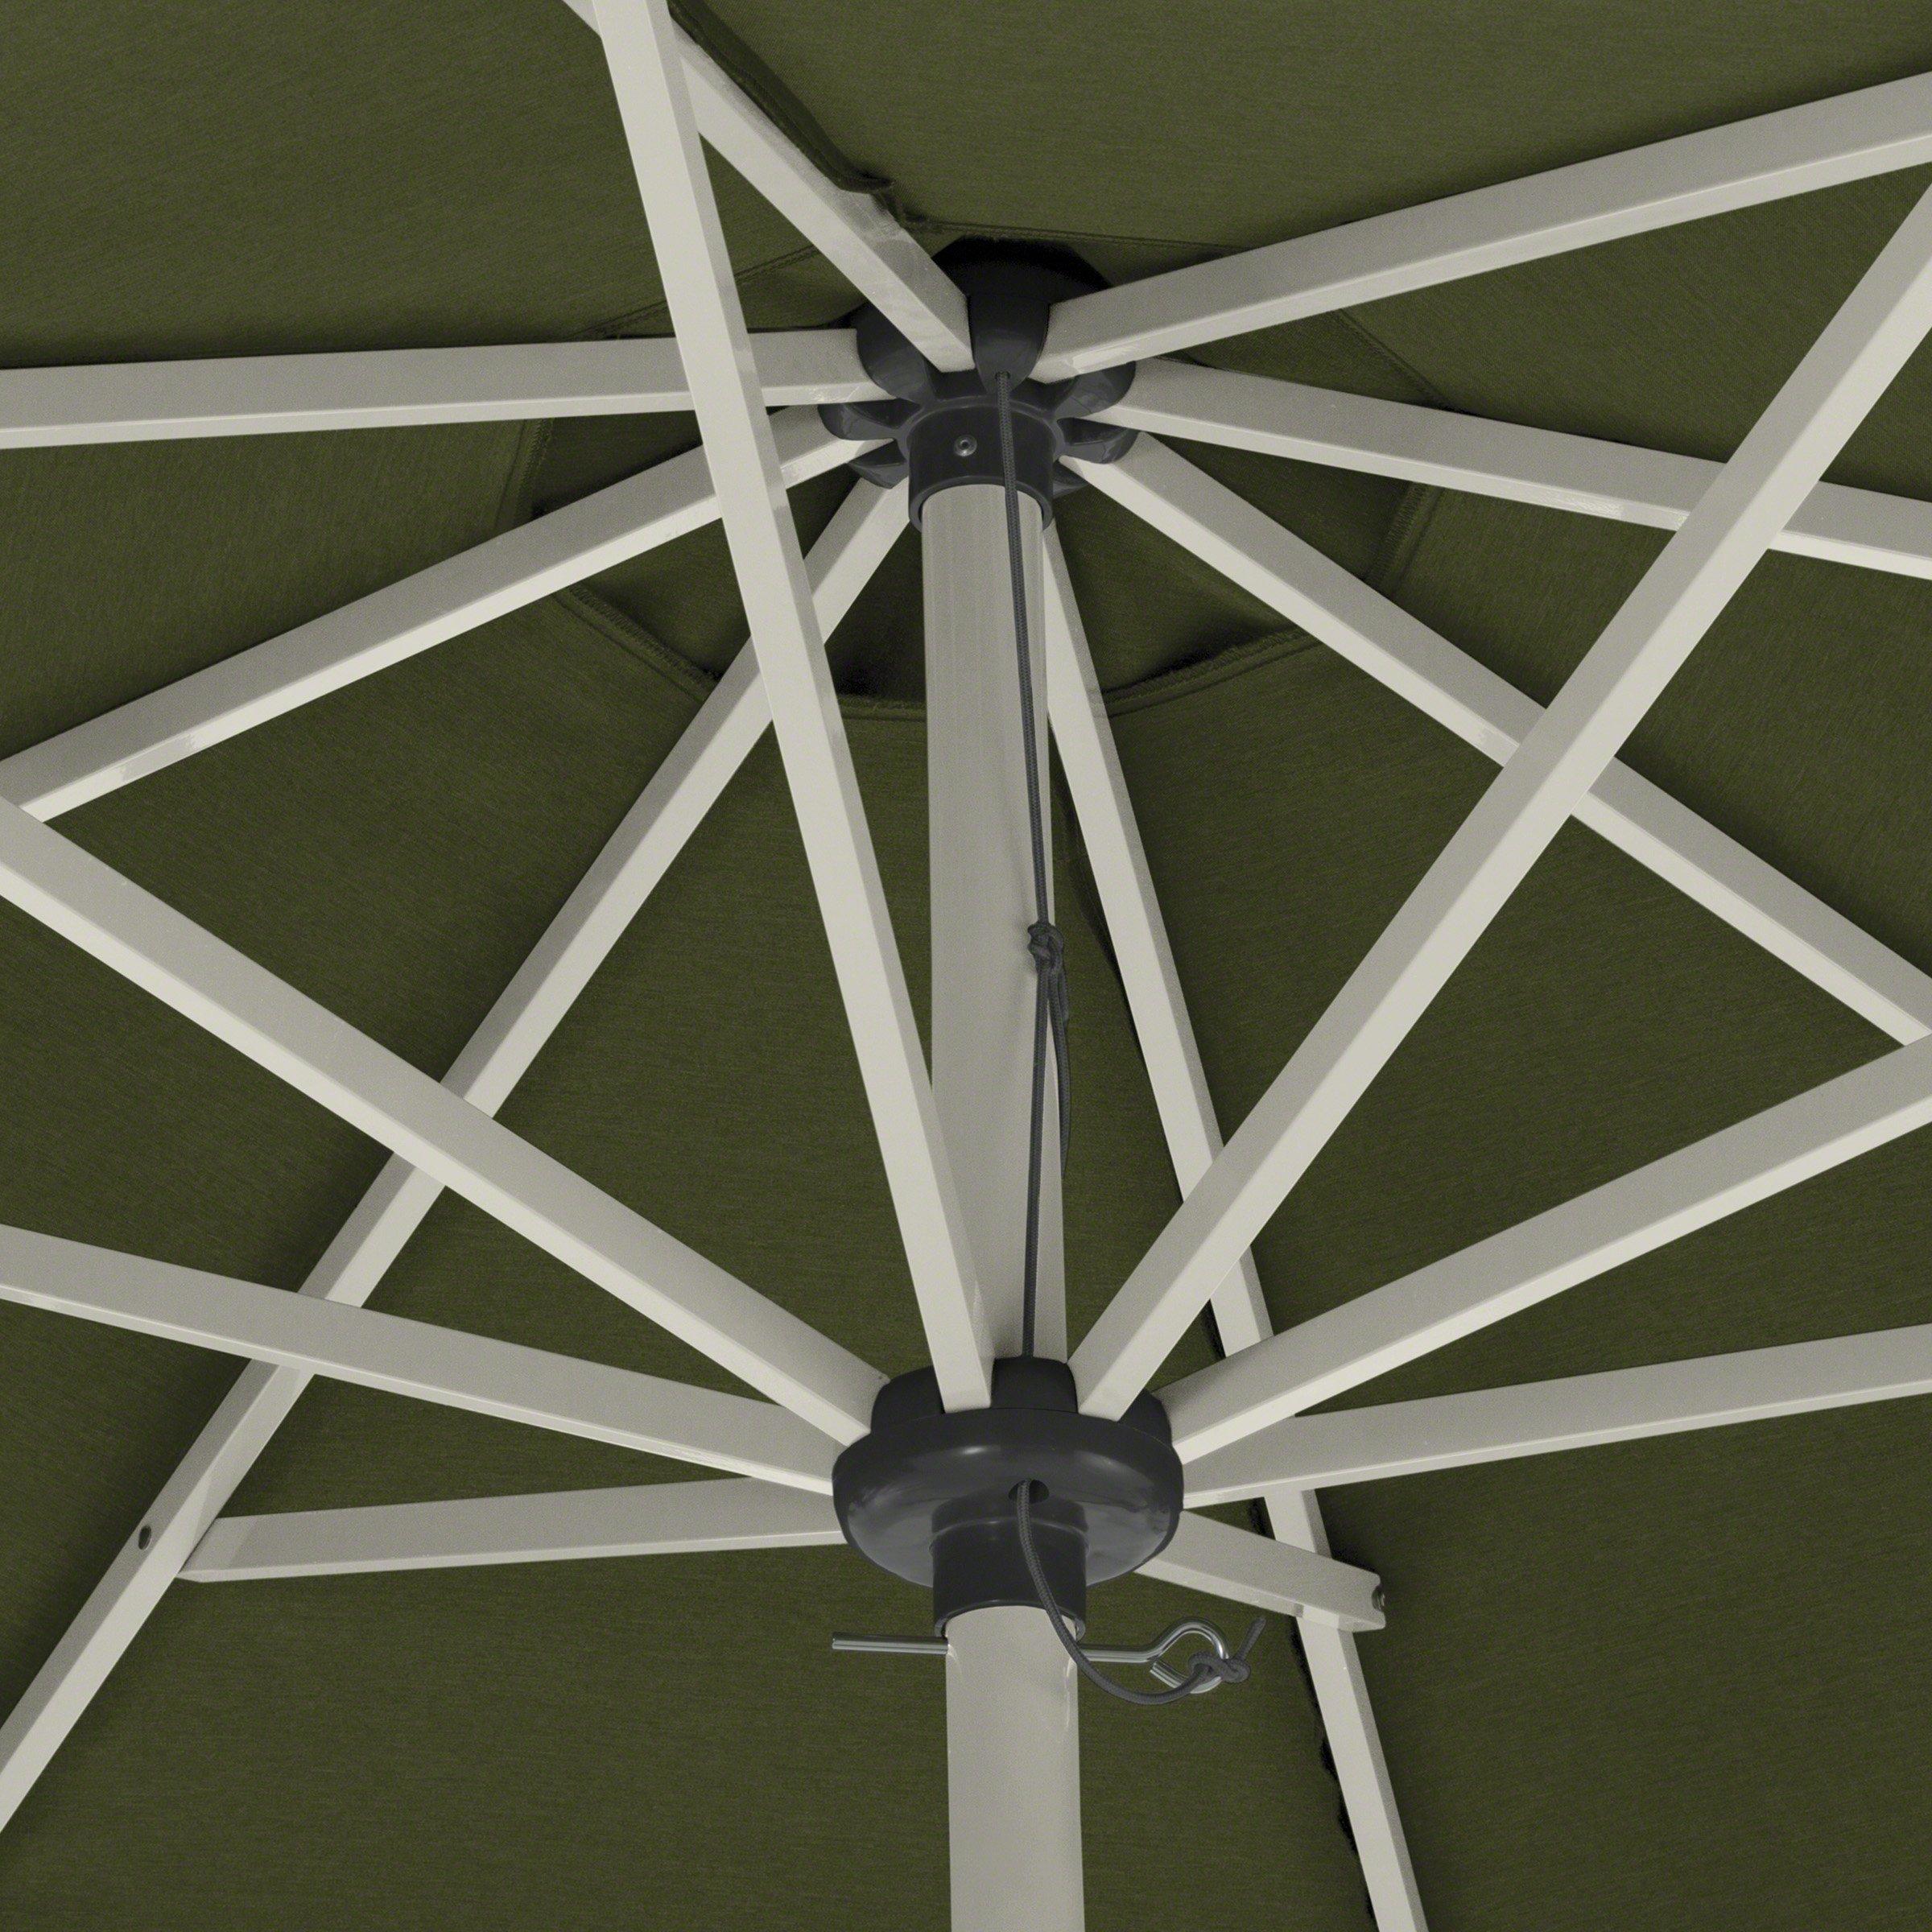 Classic Accessories Montlake FadeSafe 9-Foot Round Aluminum Patio Umbrella, Heather Fern by Classic Accessories (Image #6)